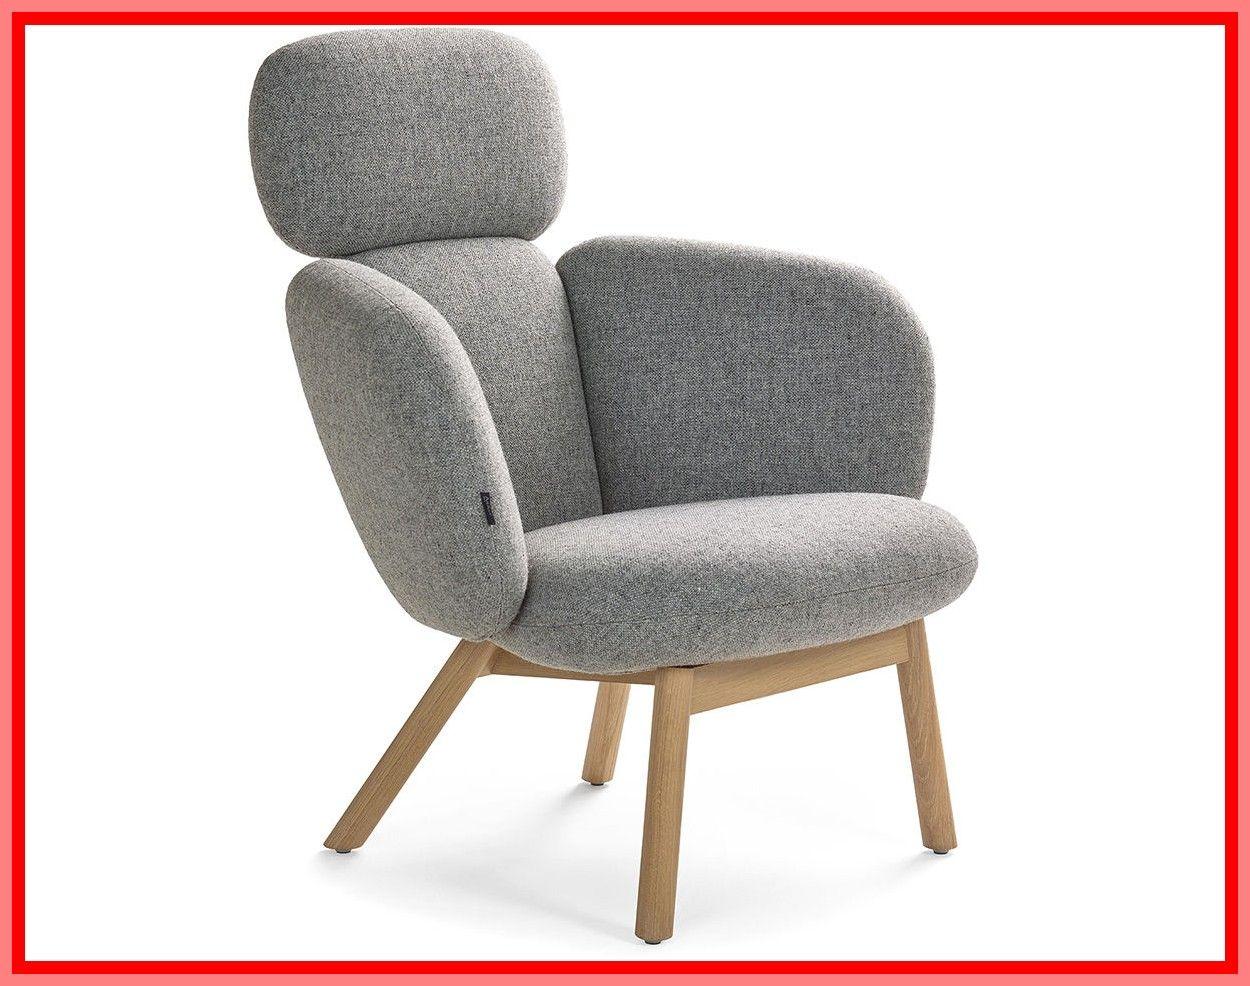 Download Wallpaper Used Patio Furniture For Sale In Woodbridge Va